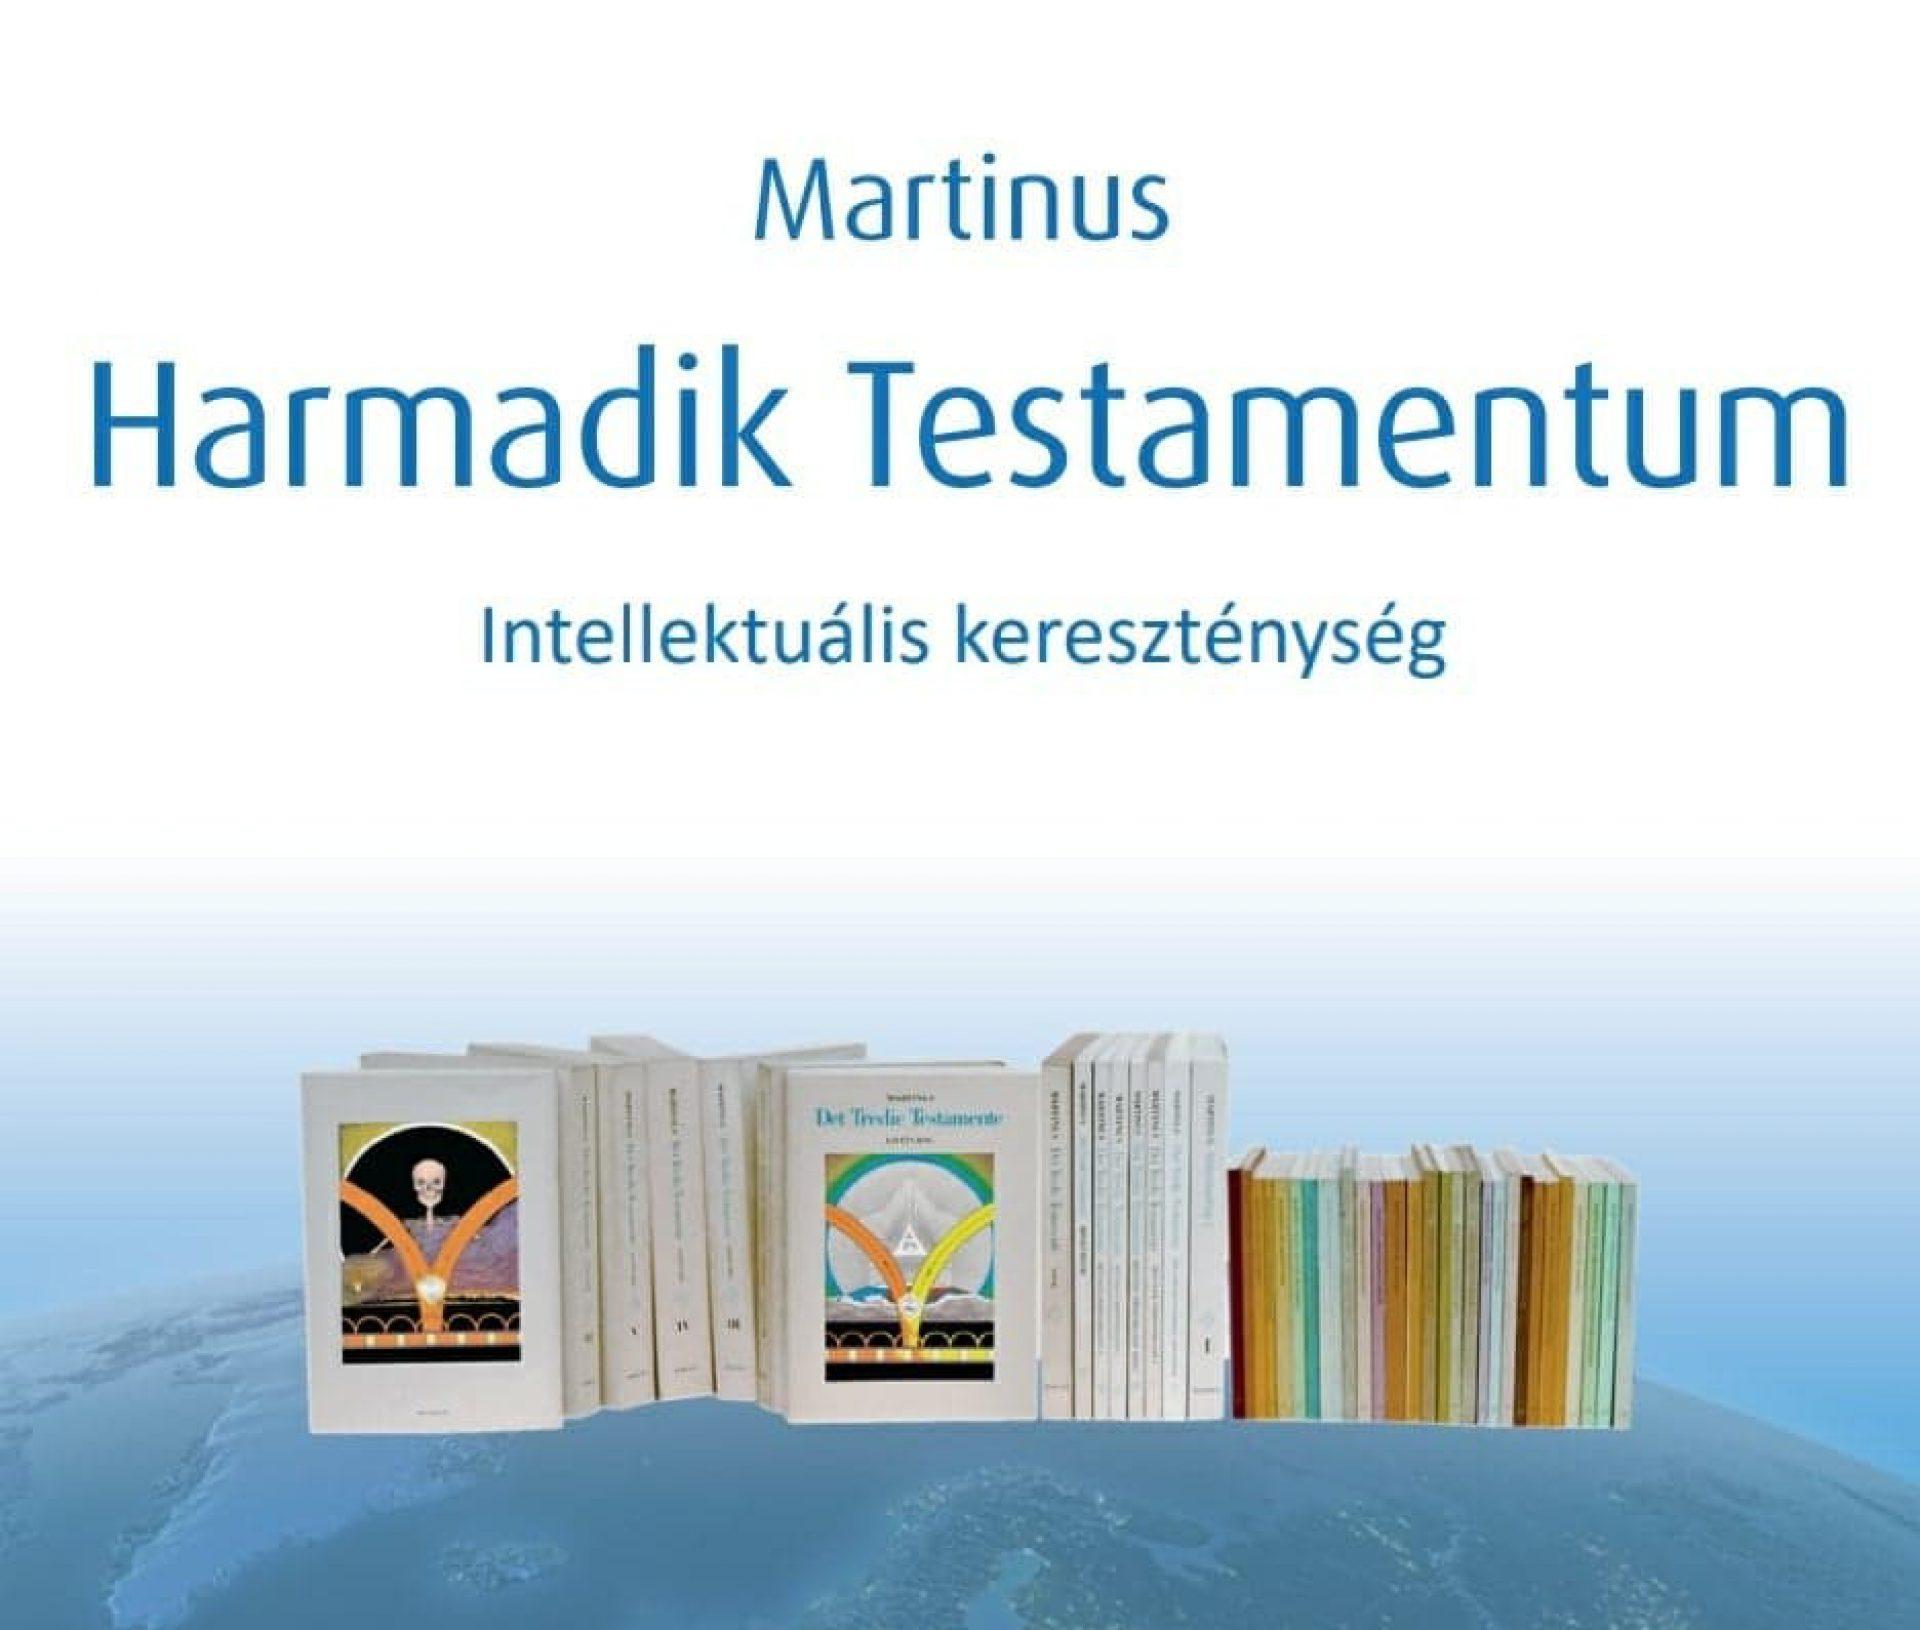 Harmadik Testamentum